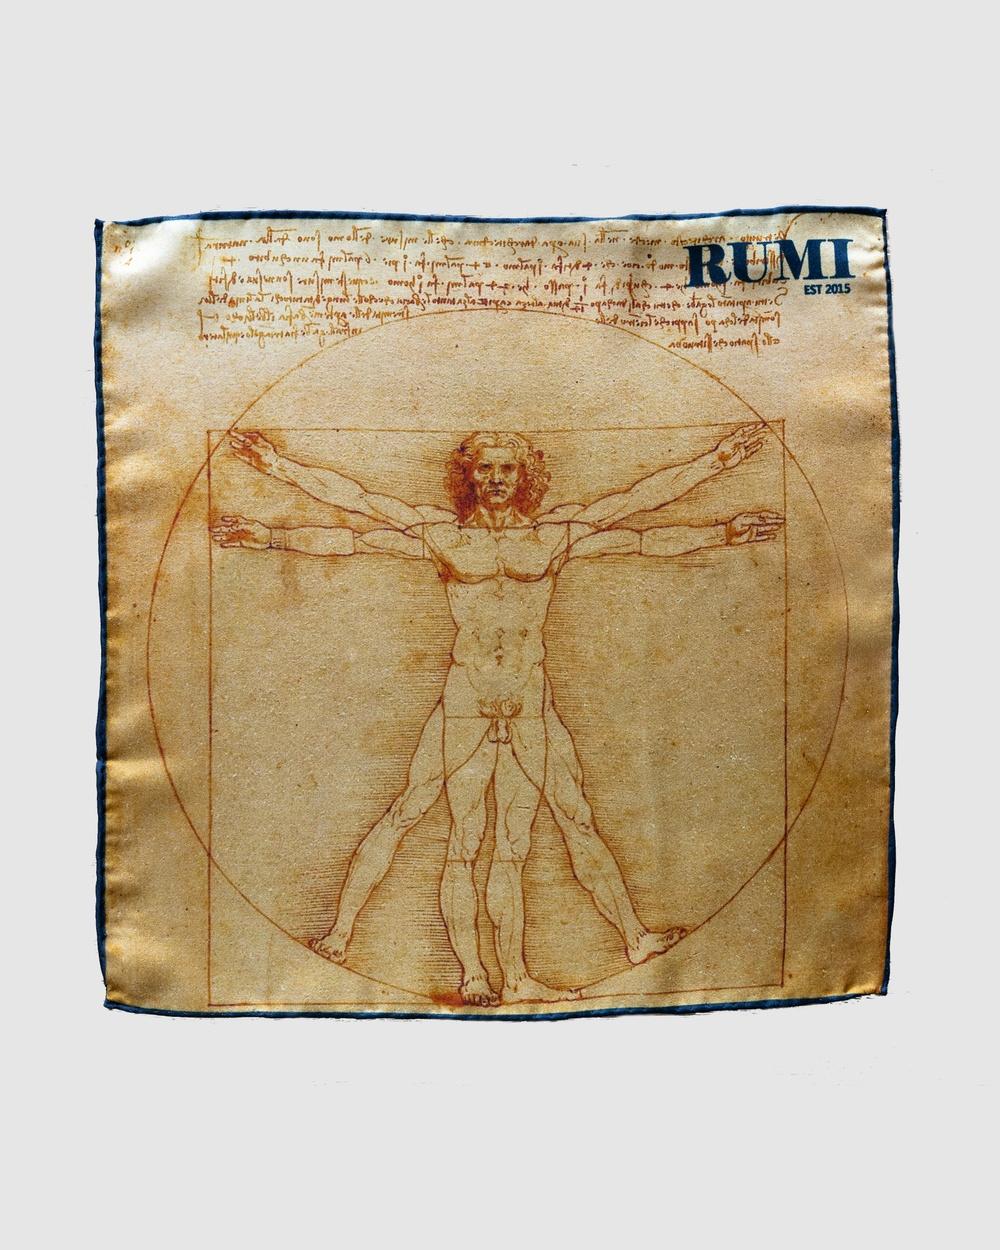 RUMI Da Vinci Vitruvian Man Pocket Square Squares Orange yellow navy Pocket Squares Australia